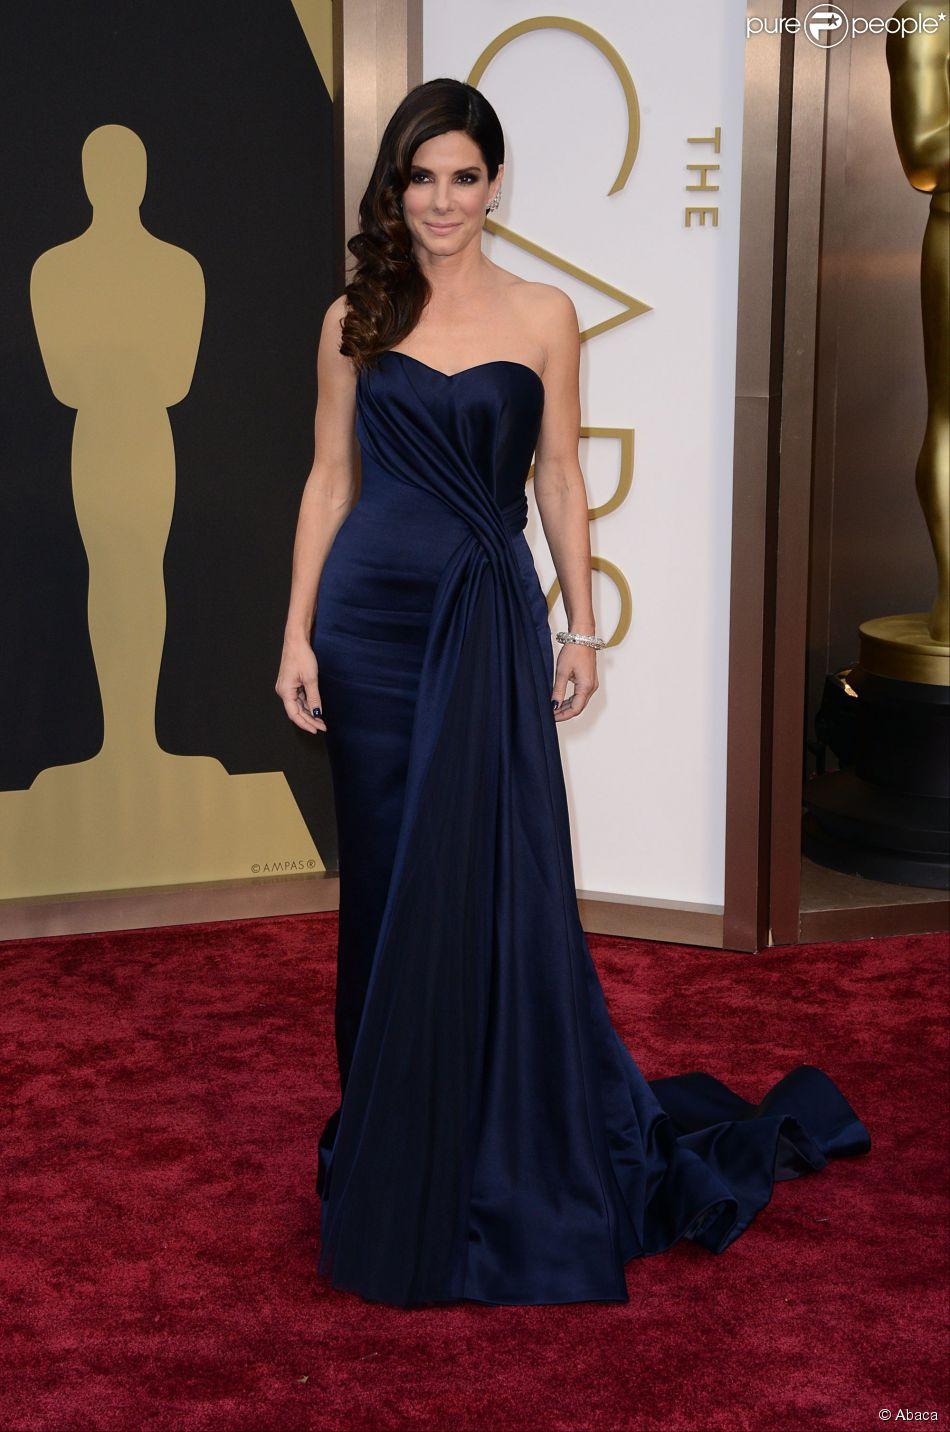 Sandra Bullock lors de la cérémonie des Oscars 2014